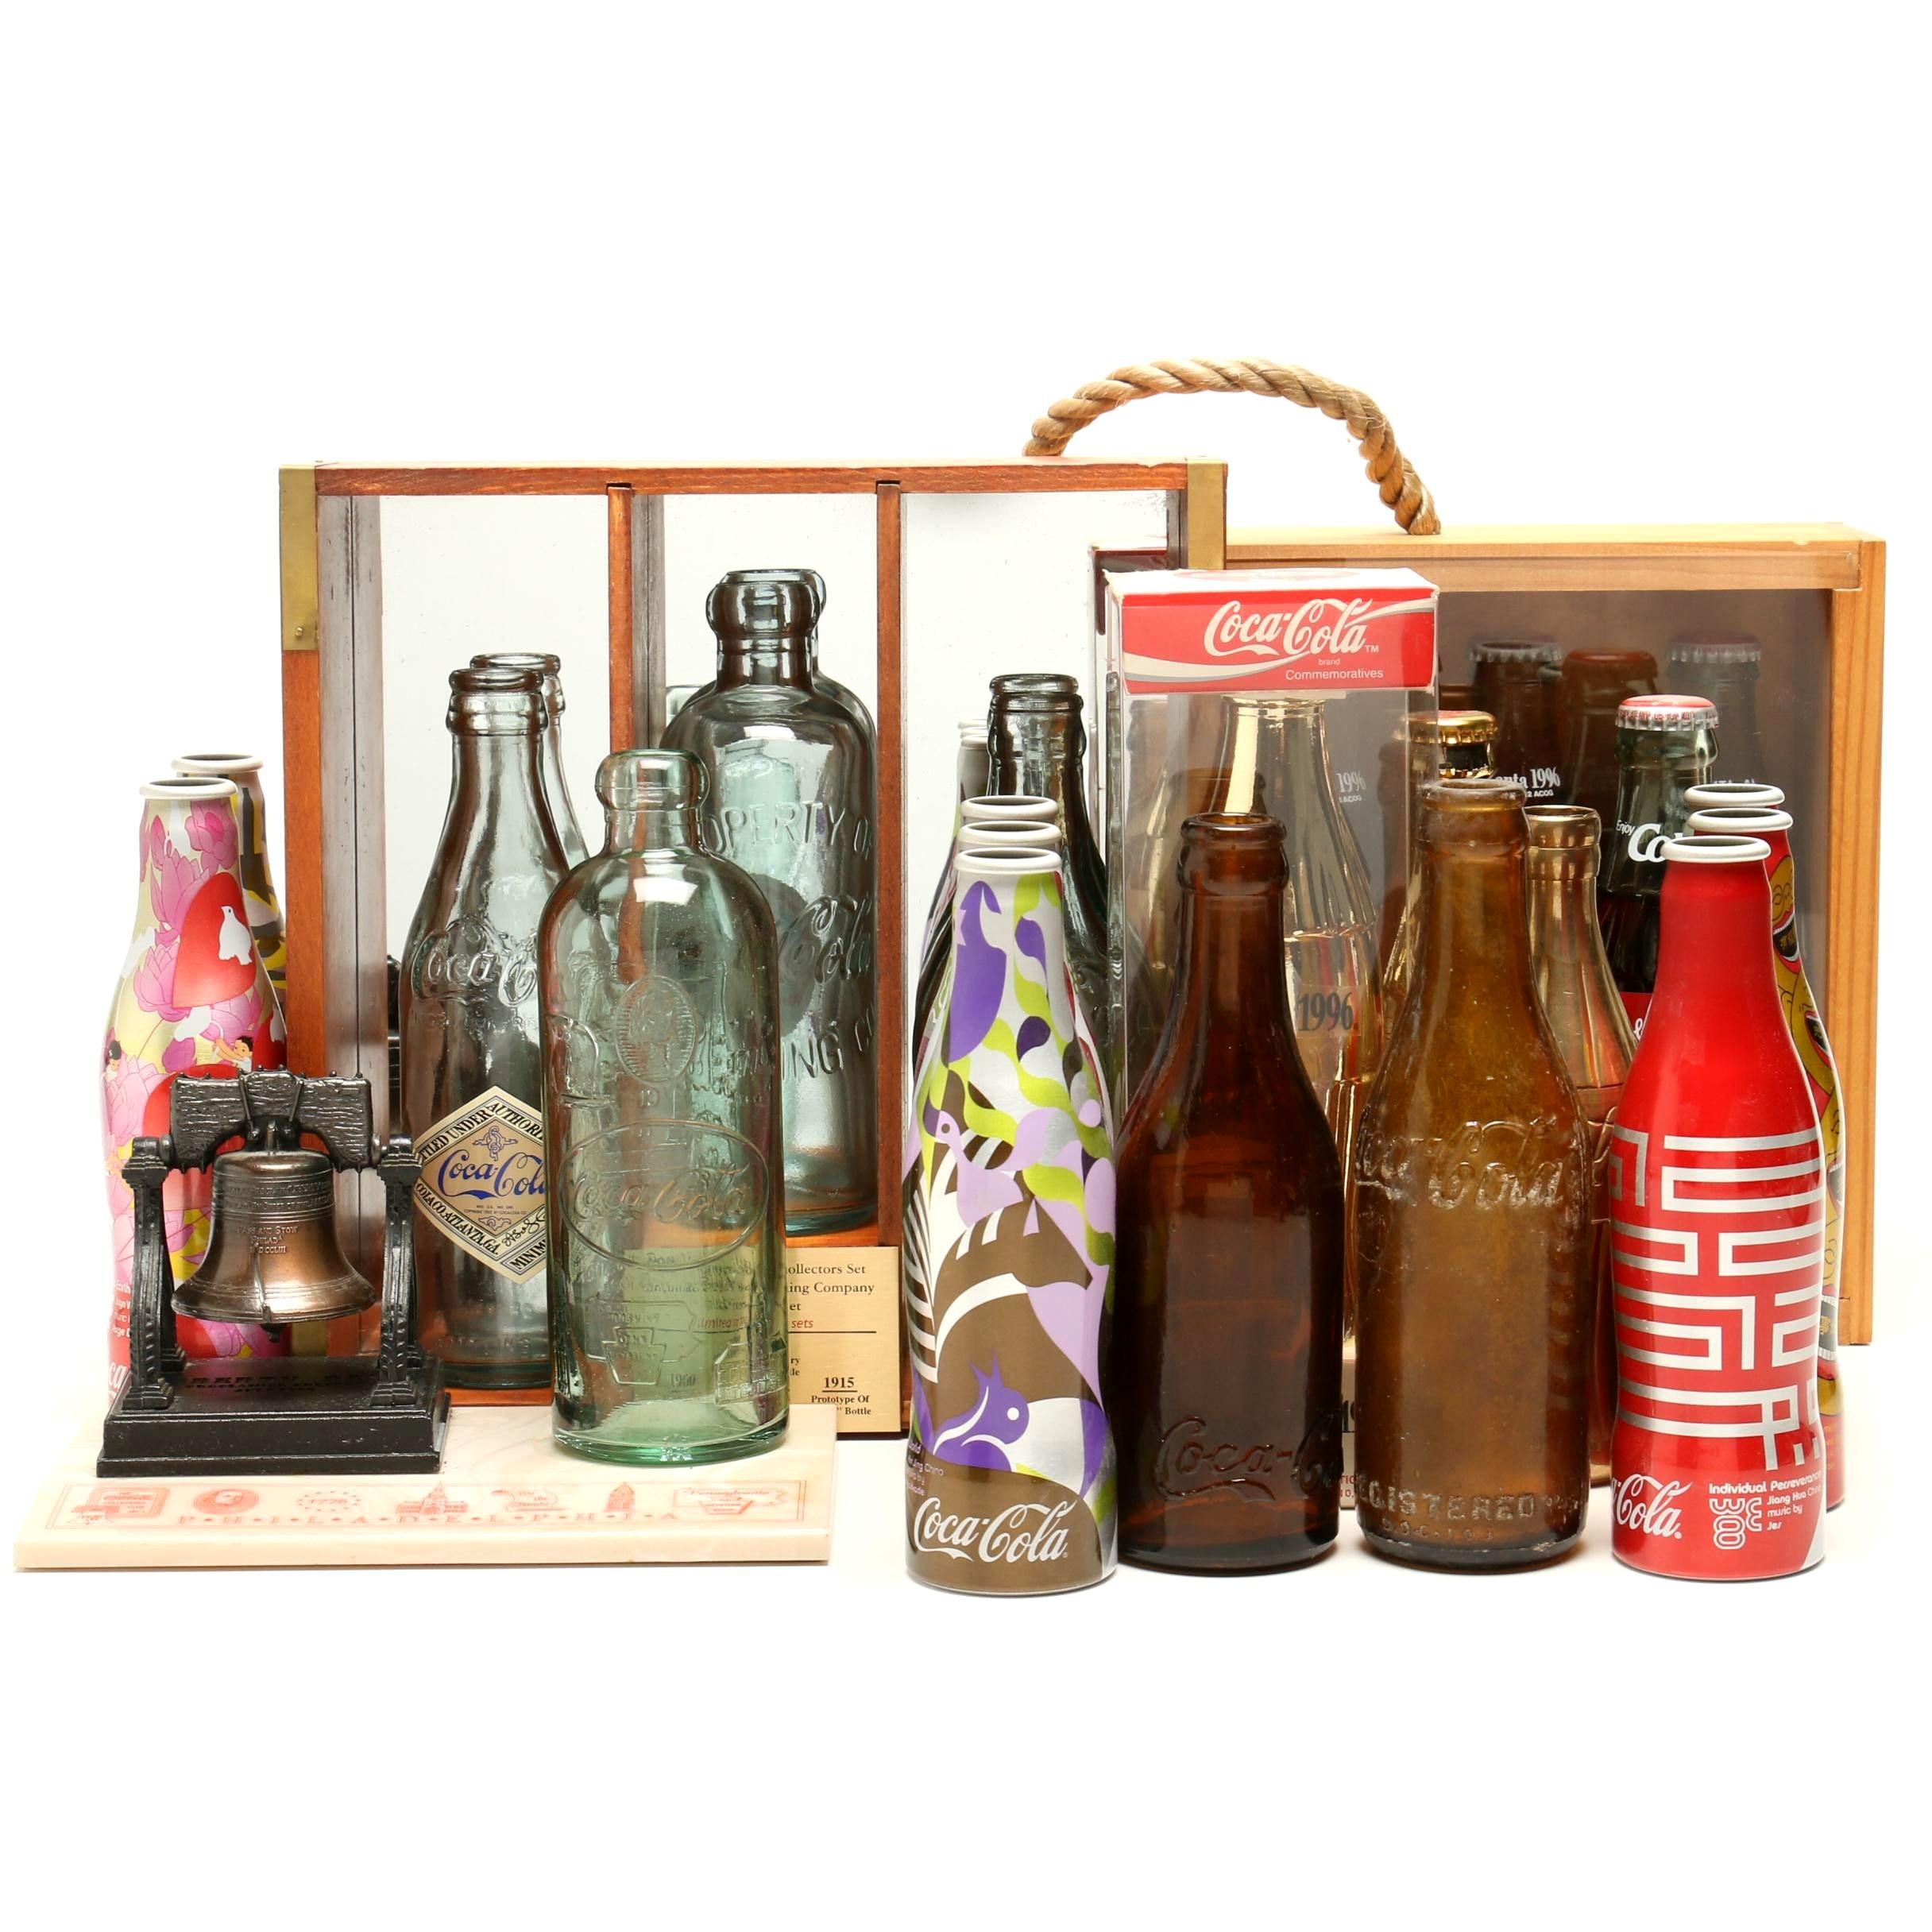 Limited Edition 100th Anniversary Cincinnati Coca-Cola Bottle Set and More